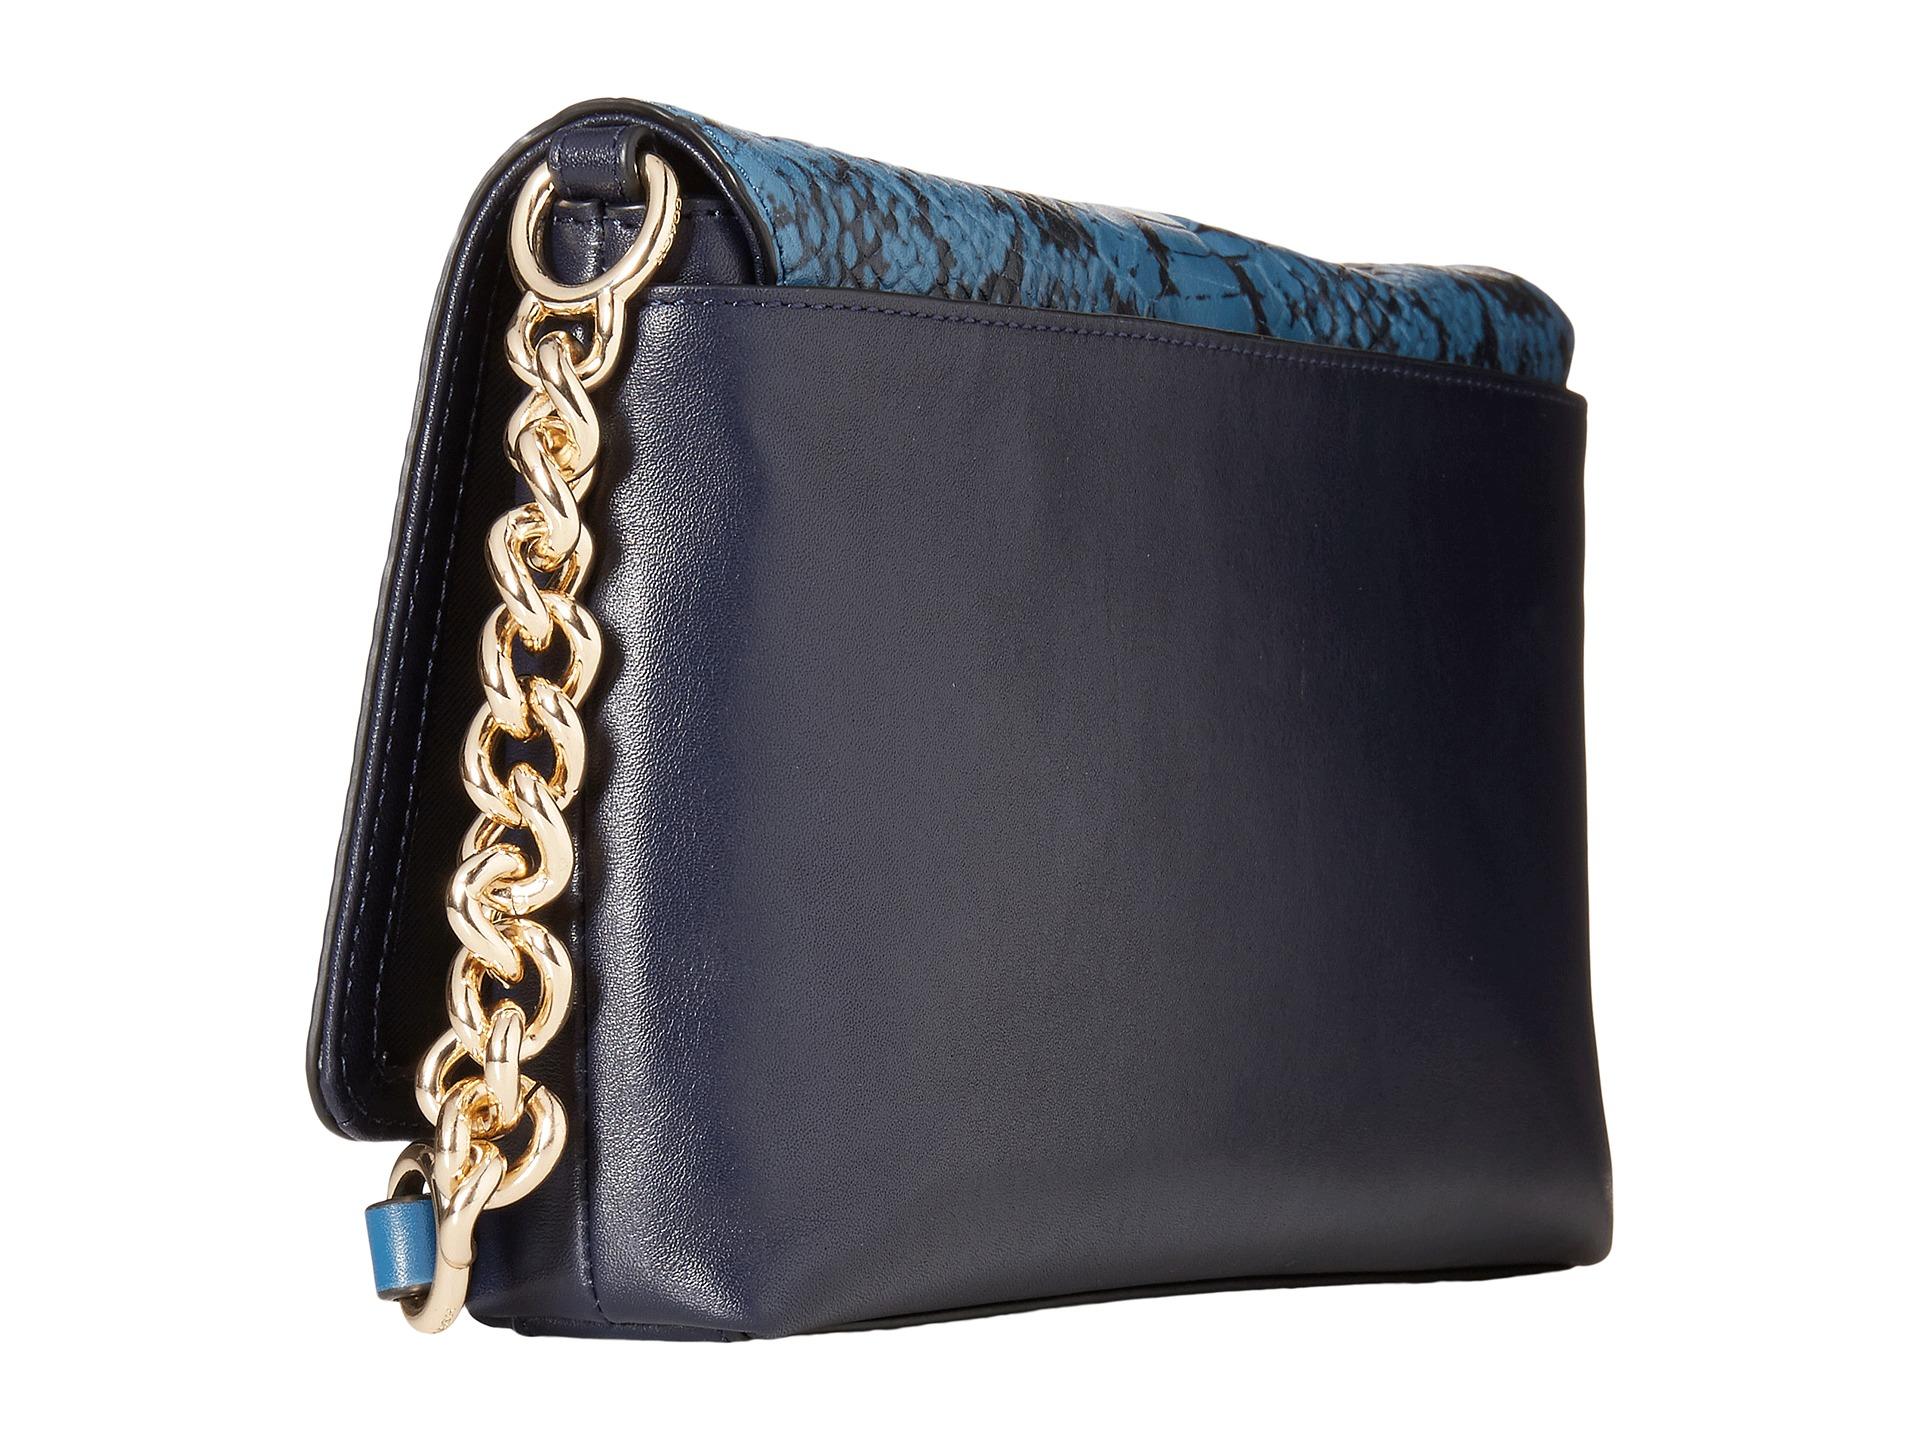 italy coach navy blue crossbody handbag f403d 520fe  spain lyst coach color  block crosstown crossbody in blue 5d160 d1abb de6272887e970